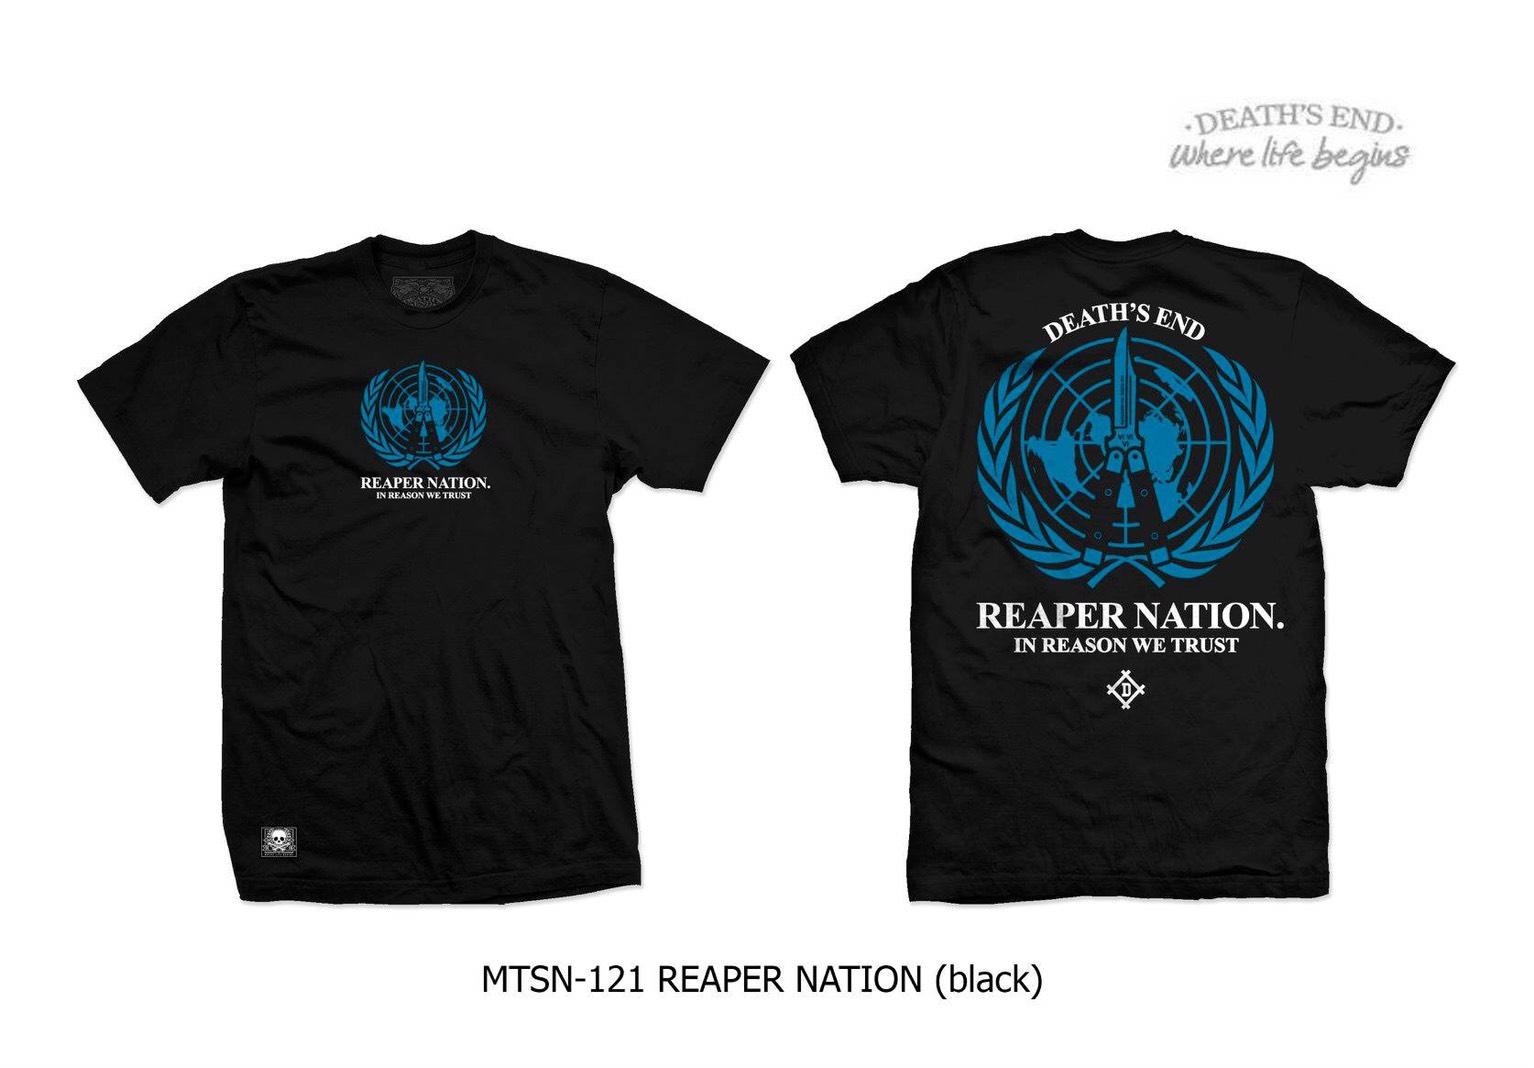 [M] เสื้อคอกลมสีดำ MTSN-121 REAPER NATION (Black)